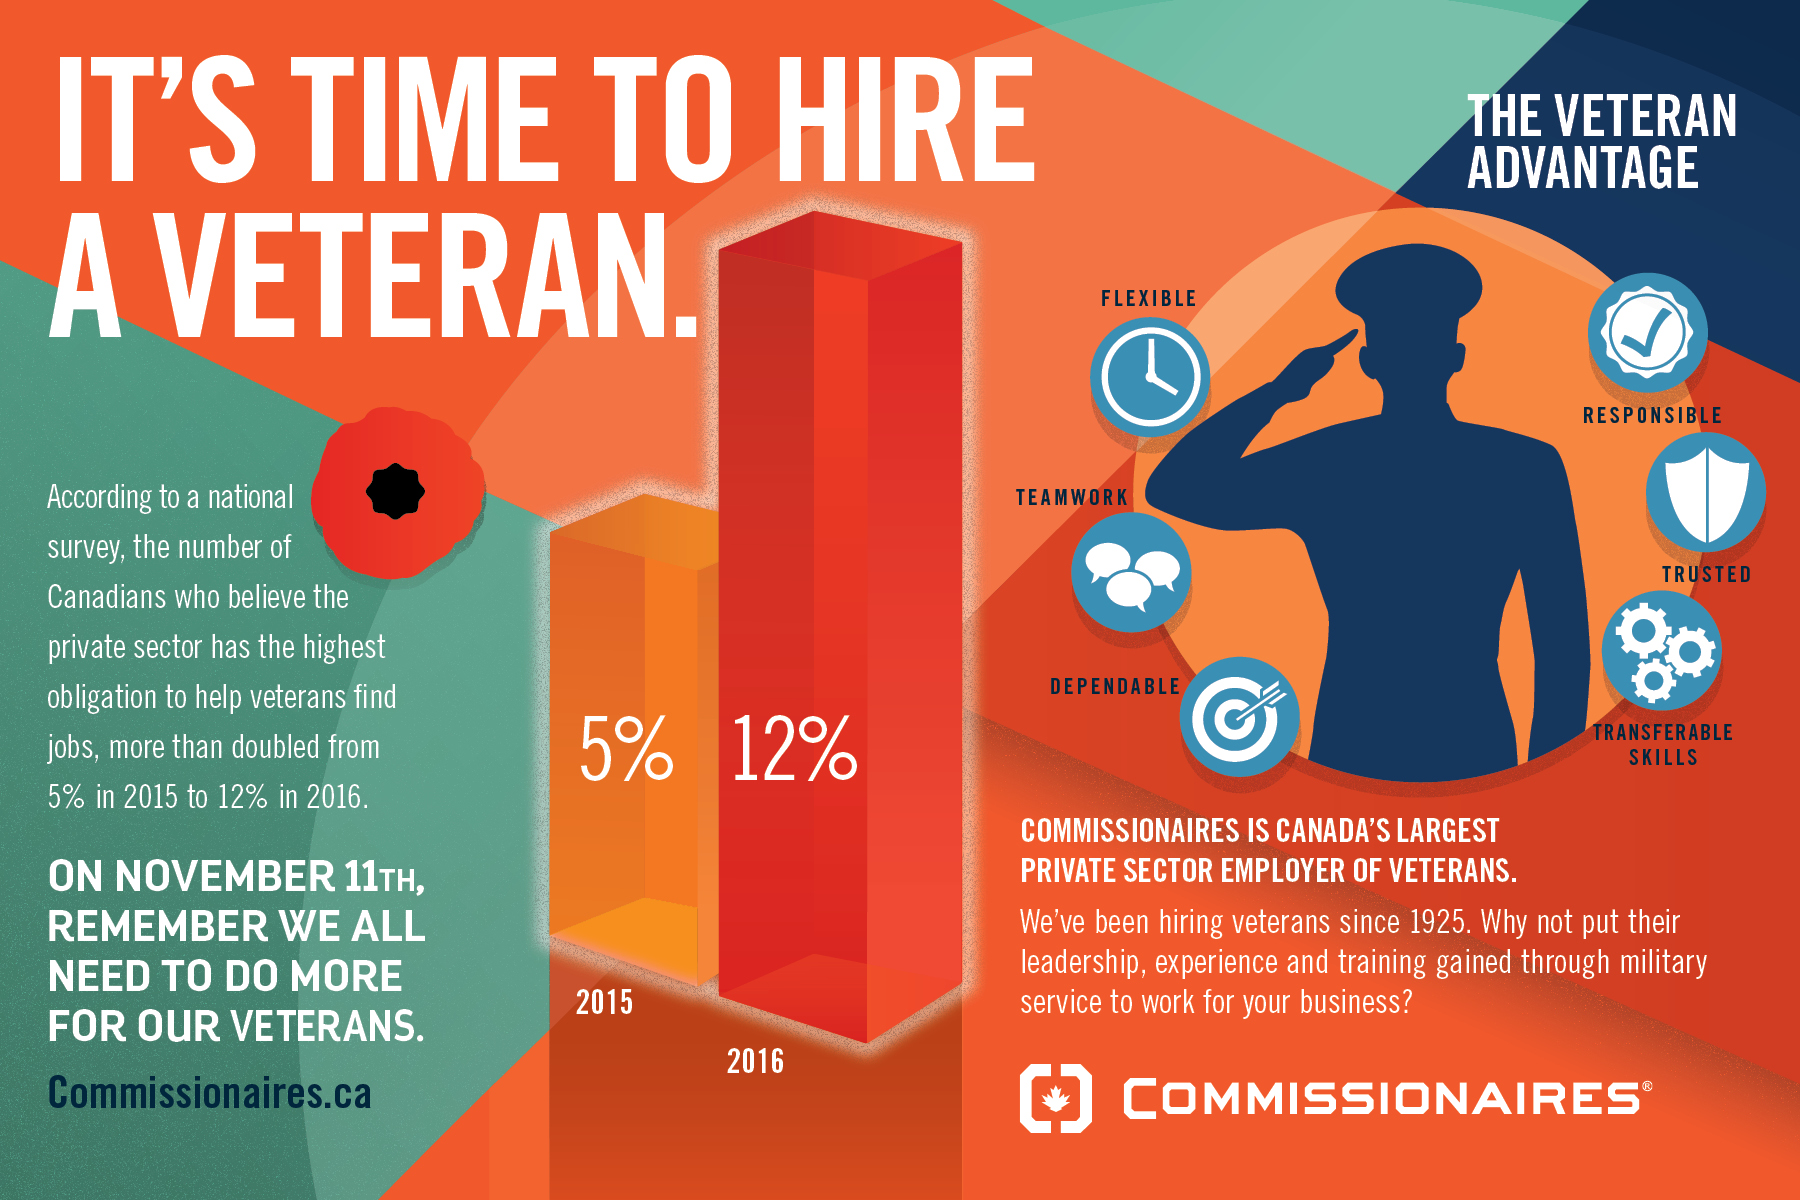 commissionaires-infographic-18-HR